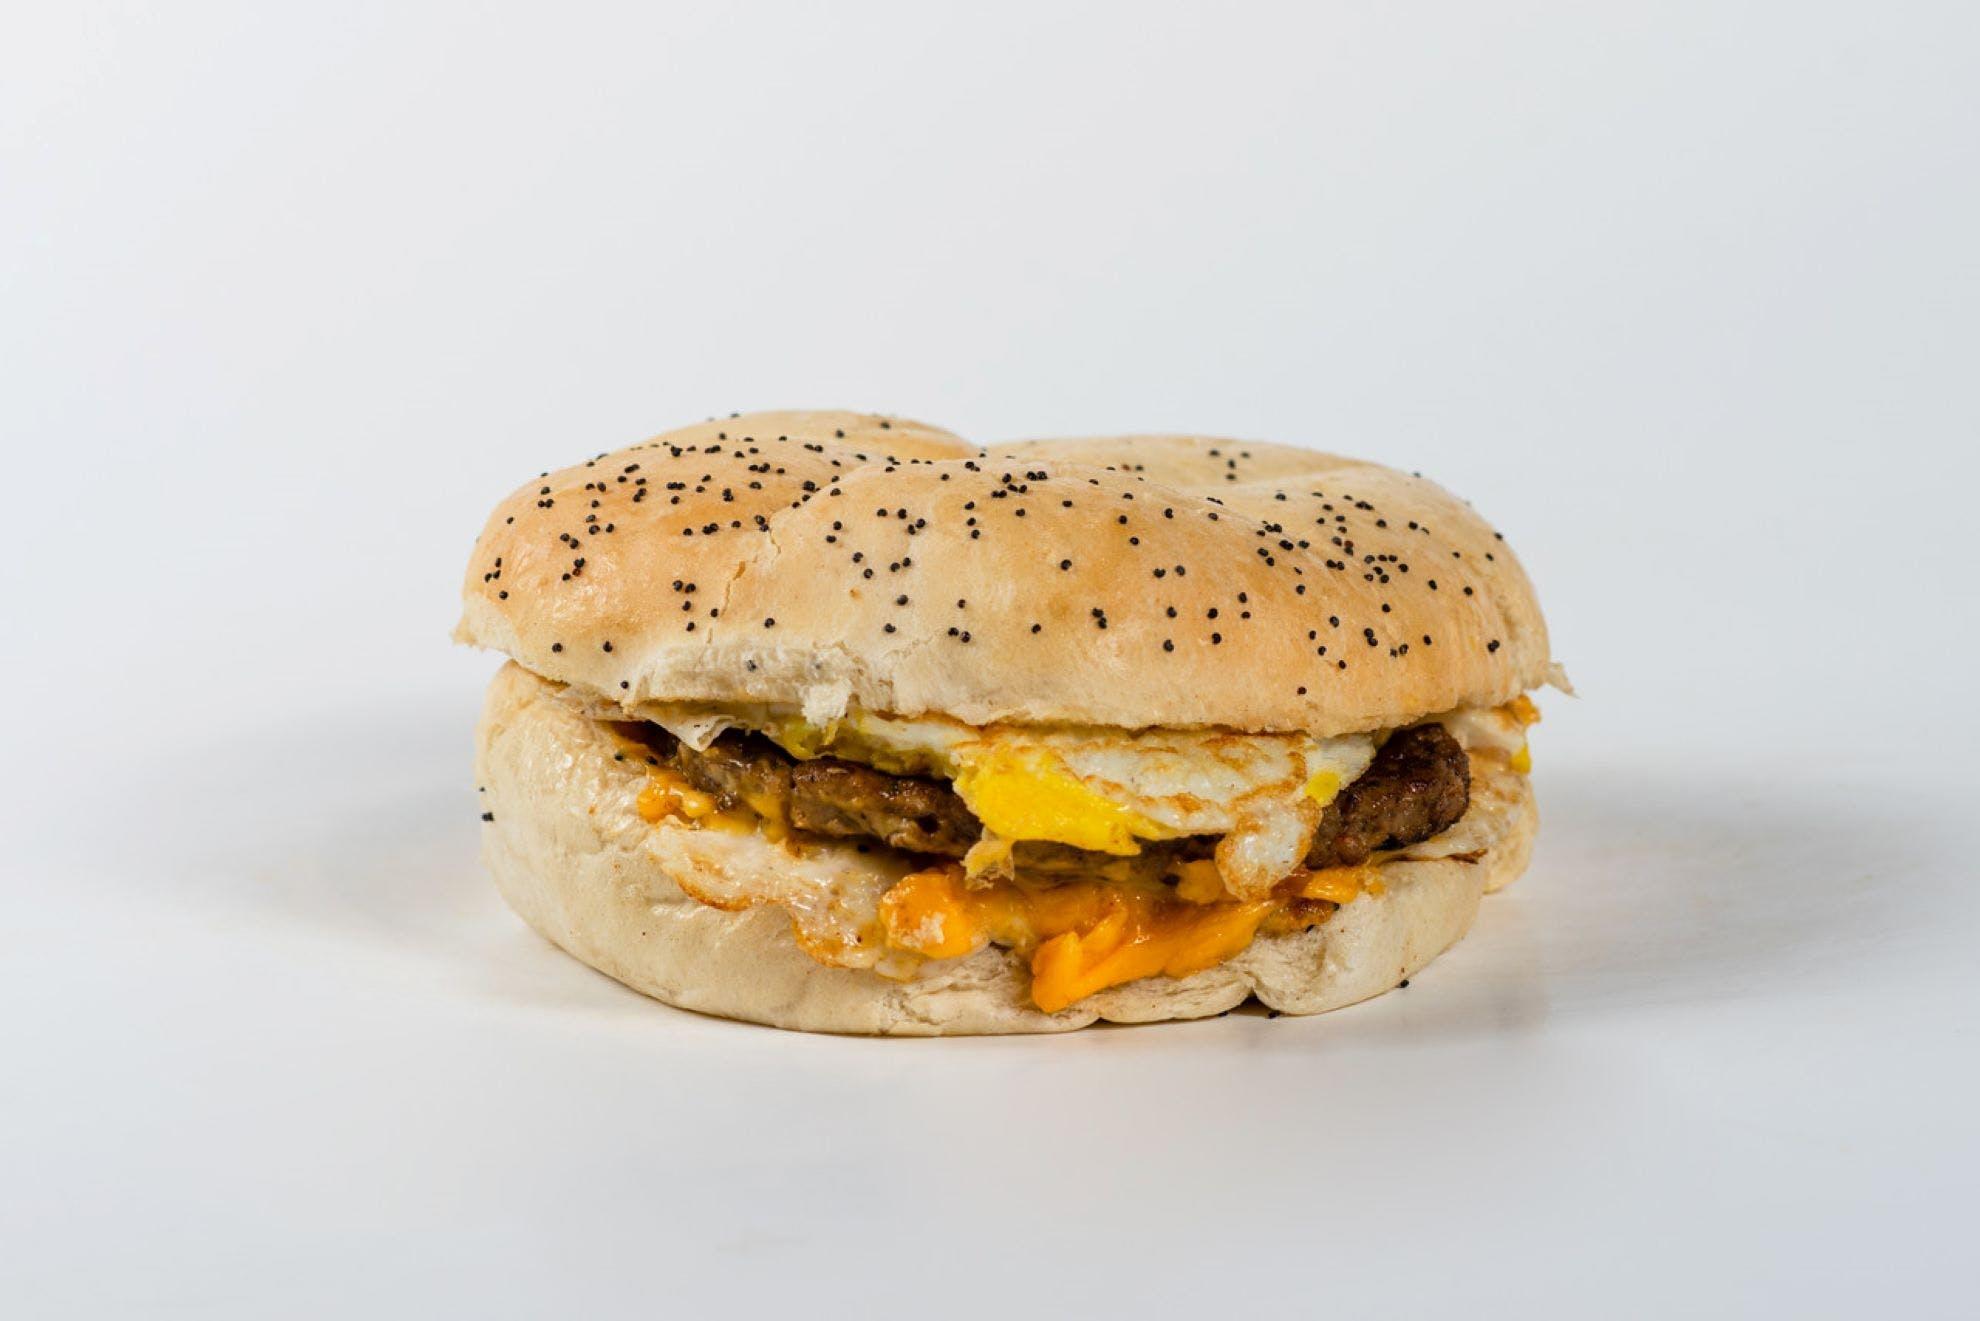 Upstate Breakfast Sandwich from Gandolfo's New York Deli - American Fork in American Fork, UT